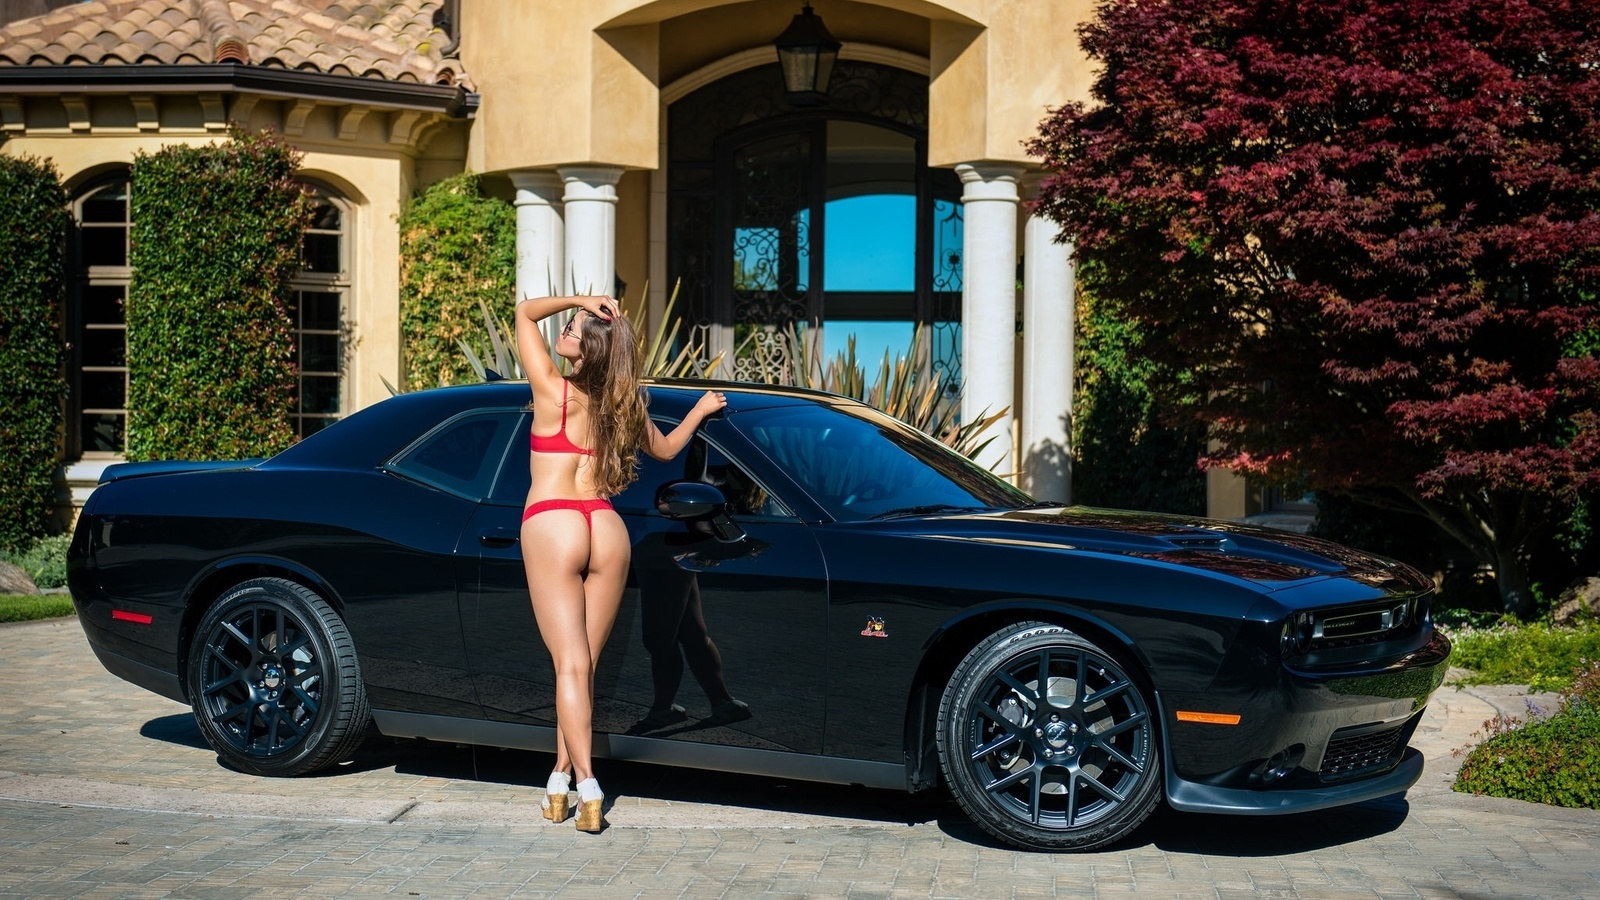 Sex pics naked girl on a black camaro musturbating linsday